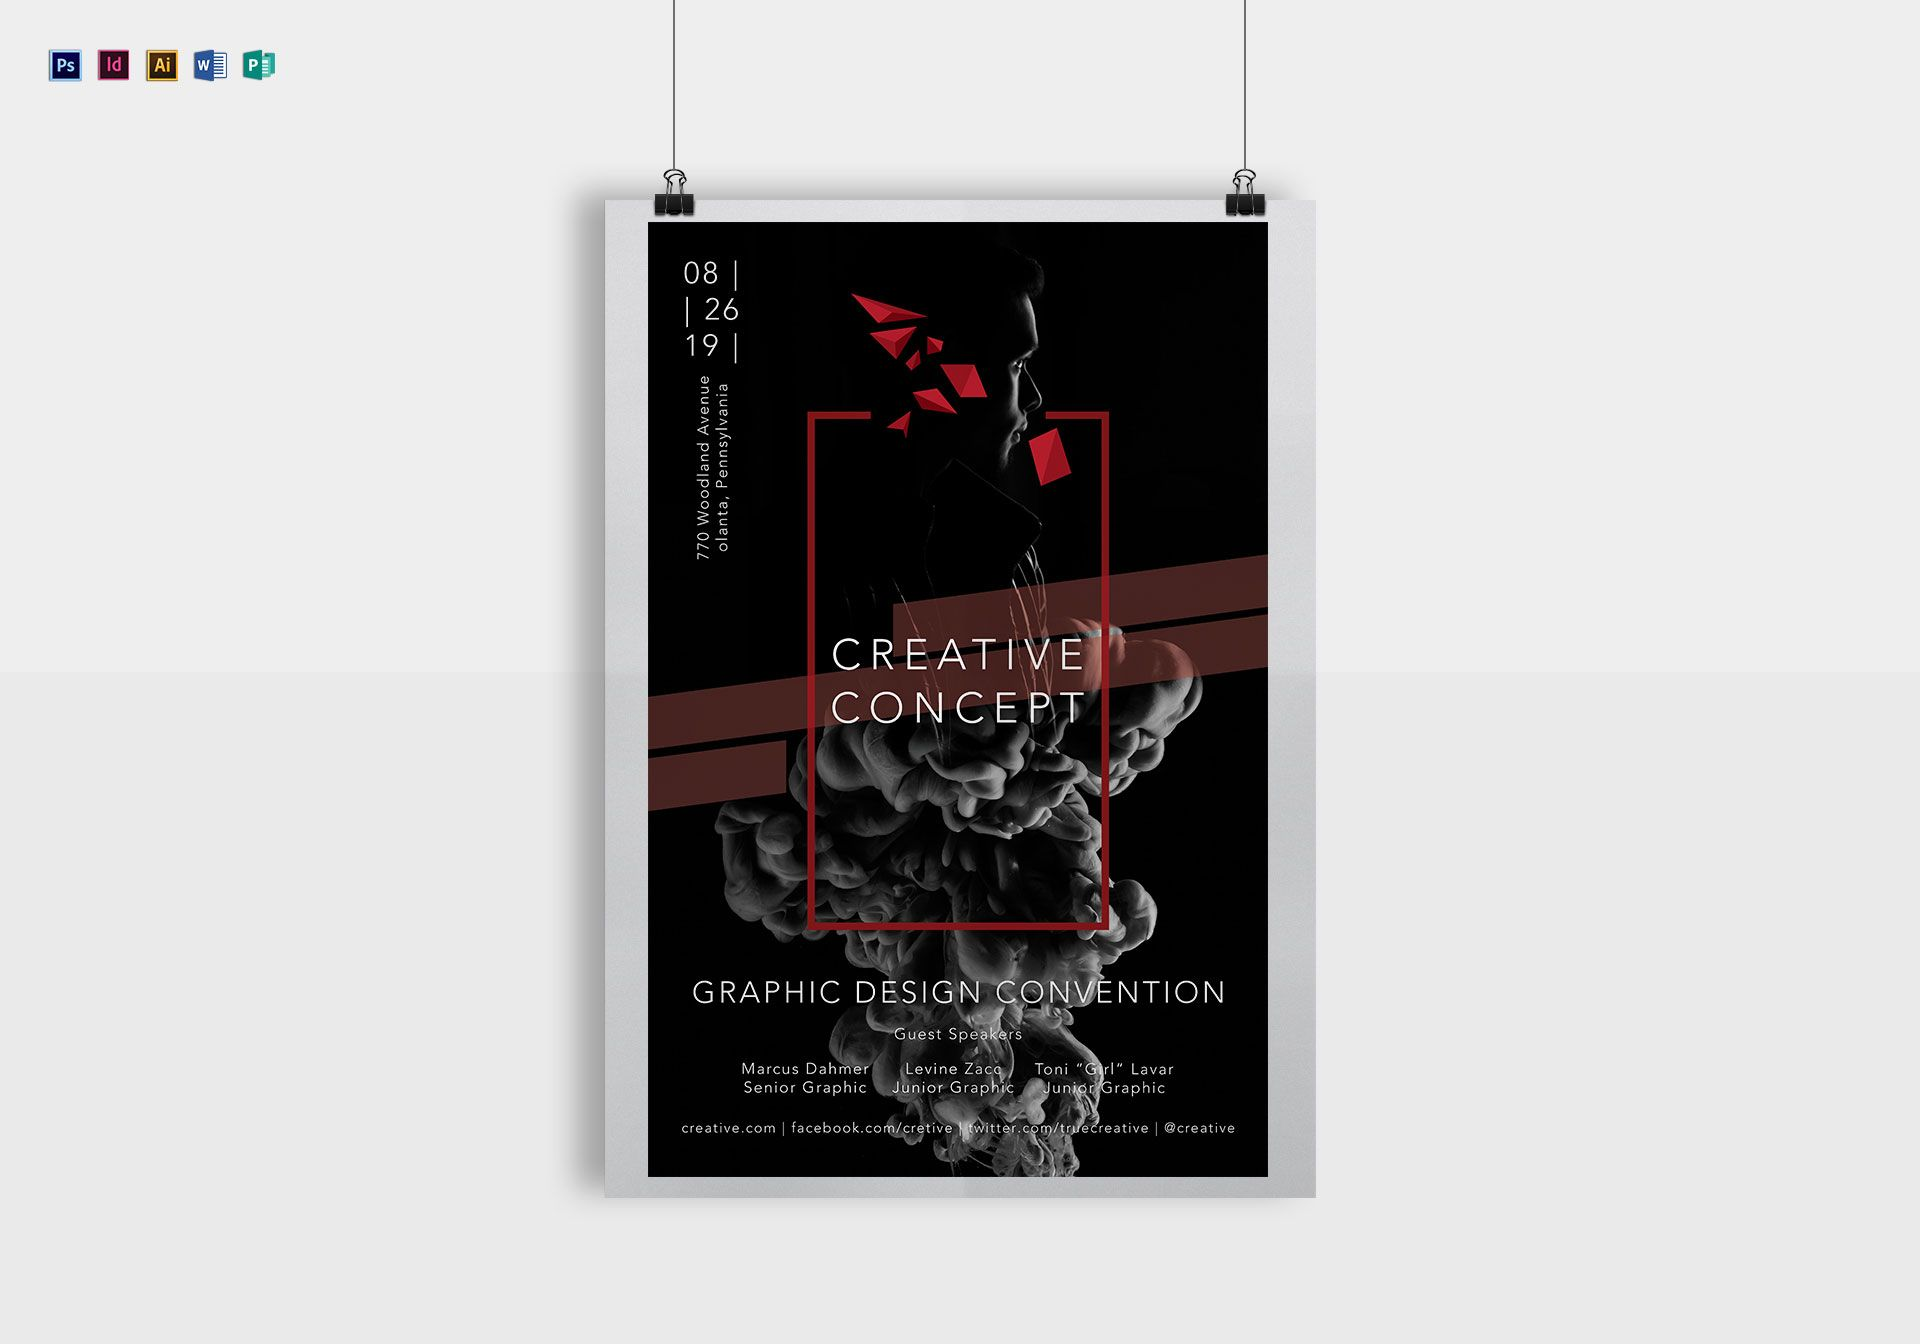 Creative Concept Poster